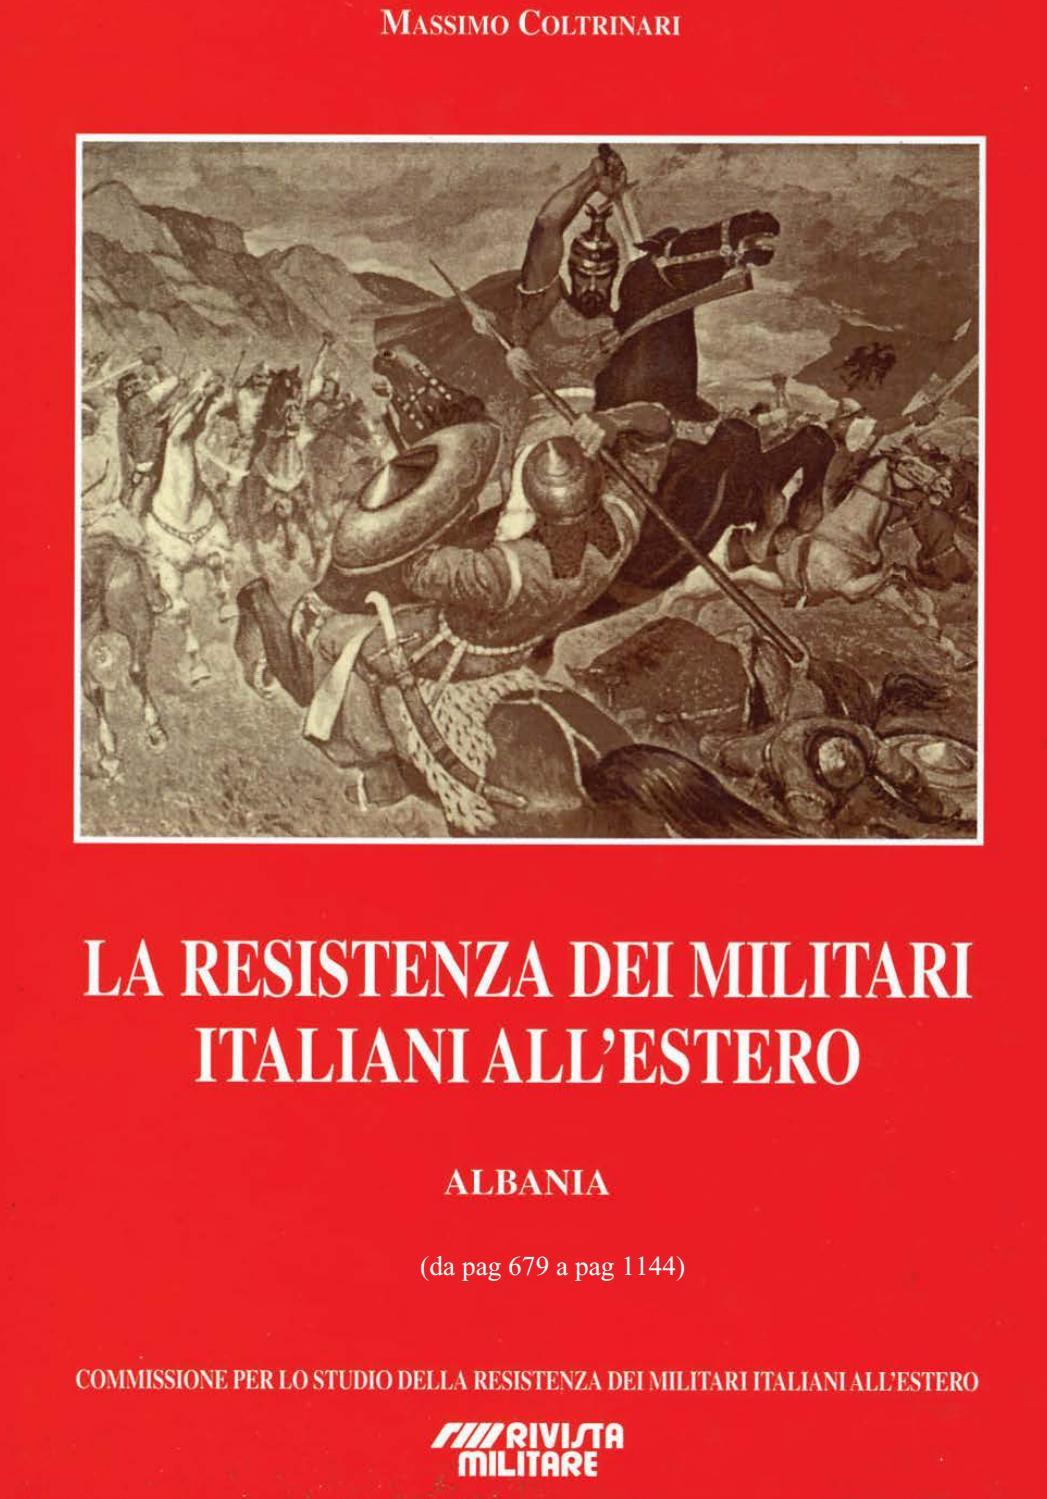 ALBANIA ( da pag 679 a pag 1144) by Biblioteca Militare - issuu 3d55a413ea7